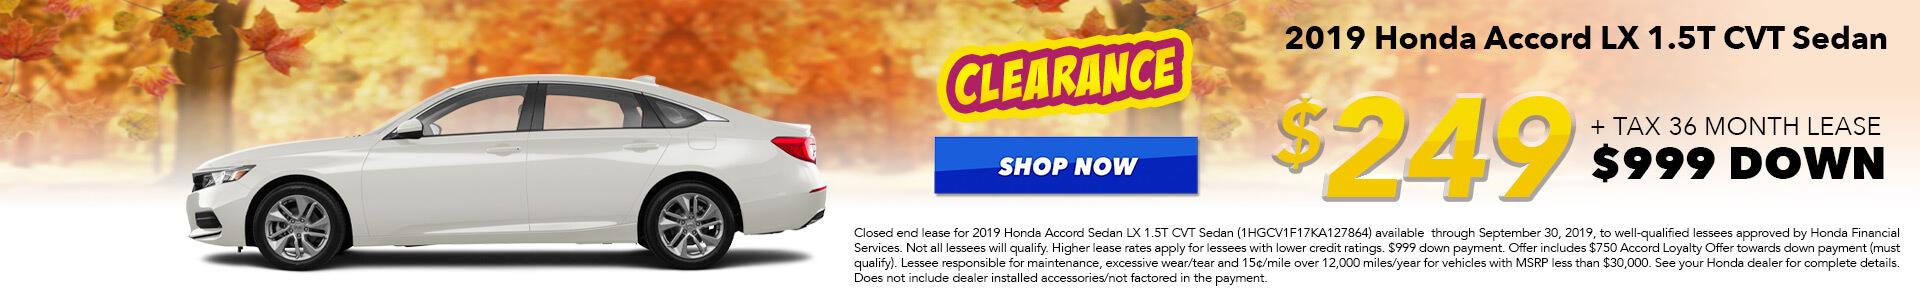 2019 Honda Accord LX Lease for $249